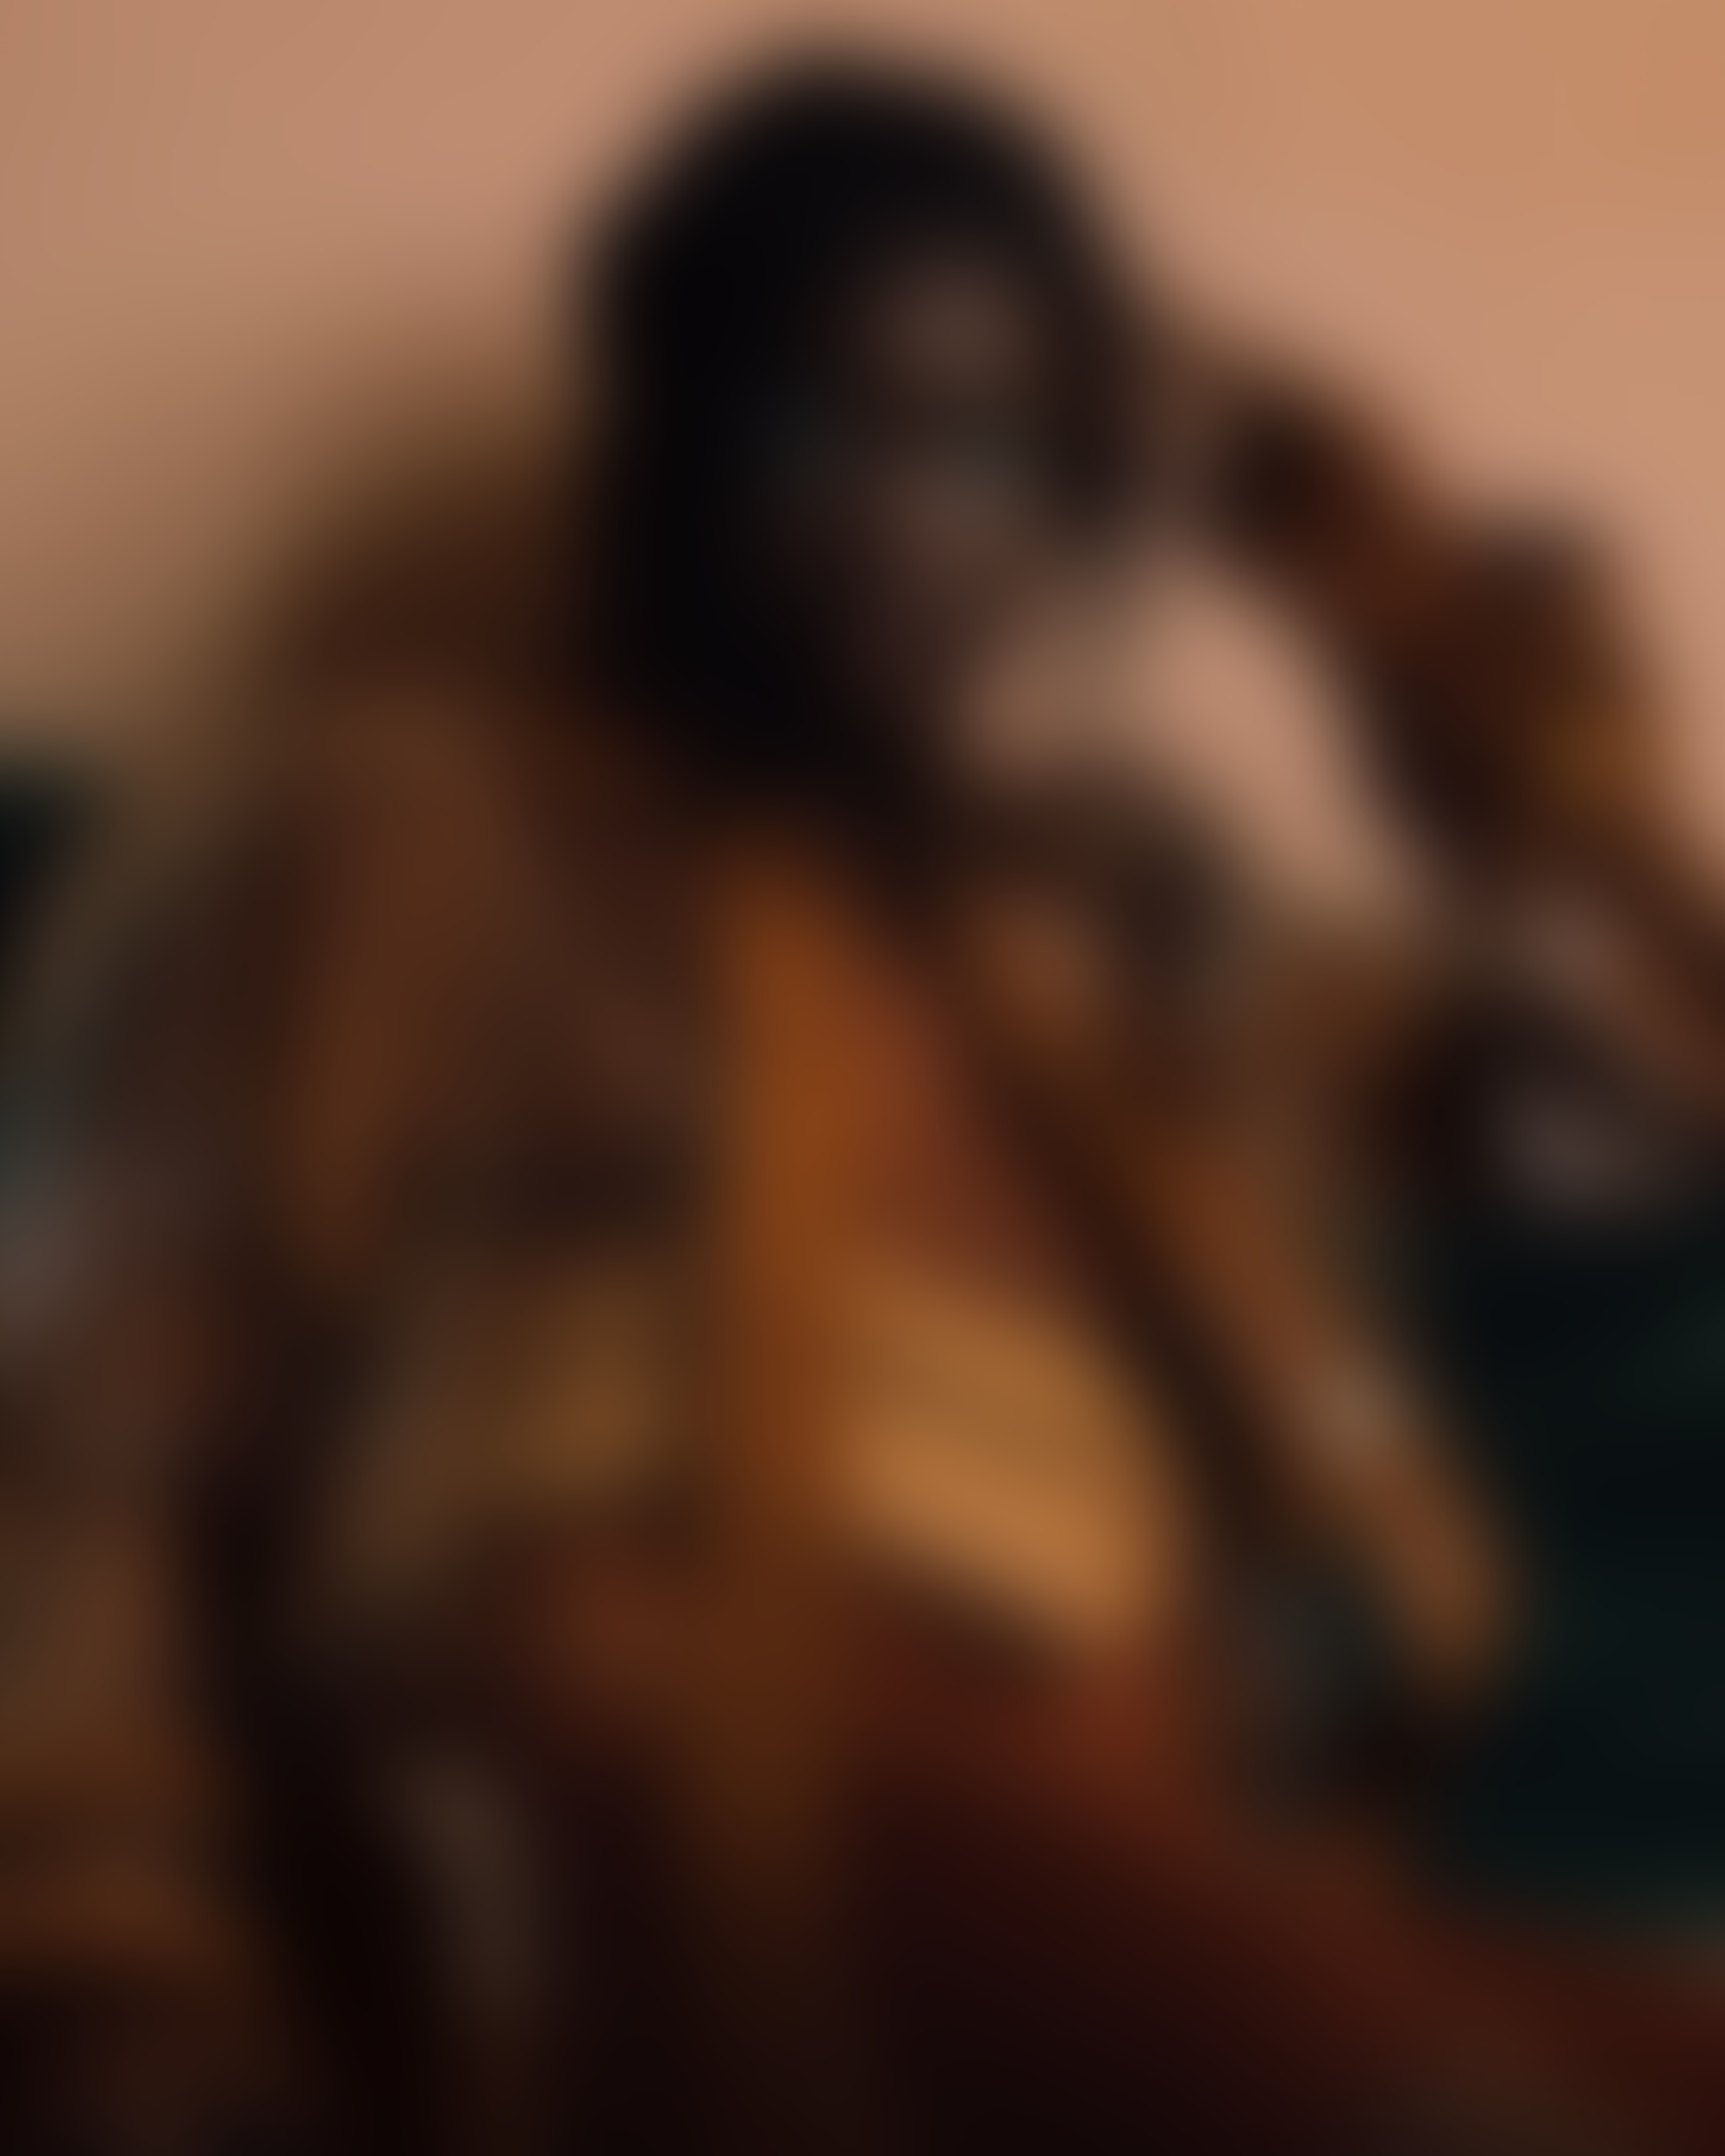 Christina nwabugo photography lectureinprogress 04 autocompressfitresizeixlibphp 1 1 0max h2000max w3 D2000q80sa702db1fbdddc47444a91fa309f9899b